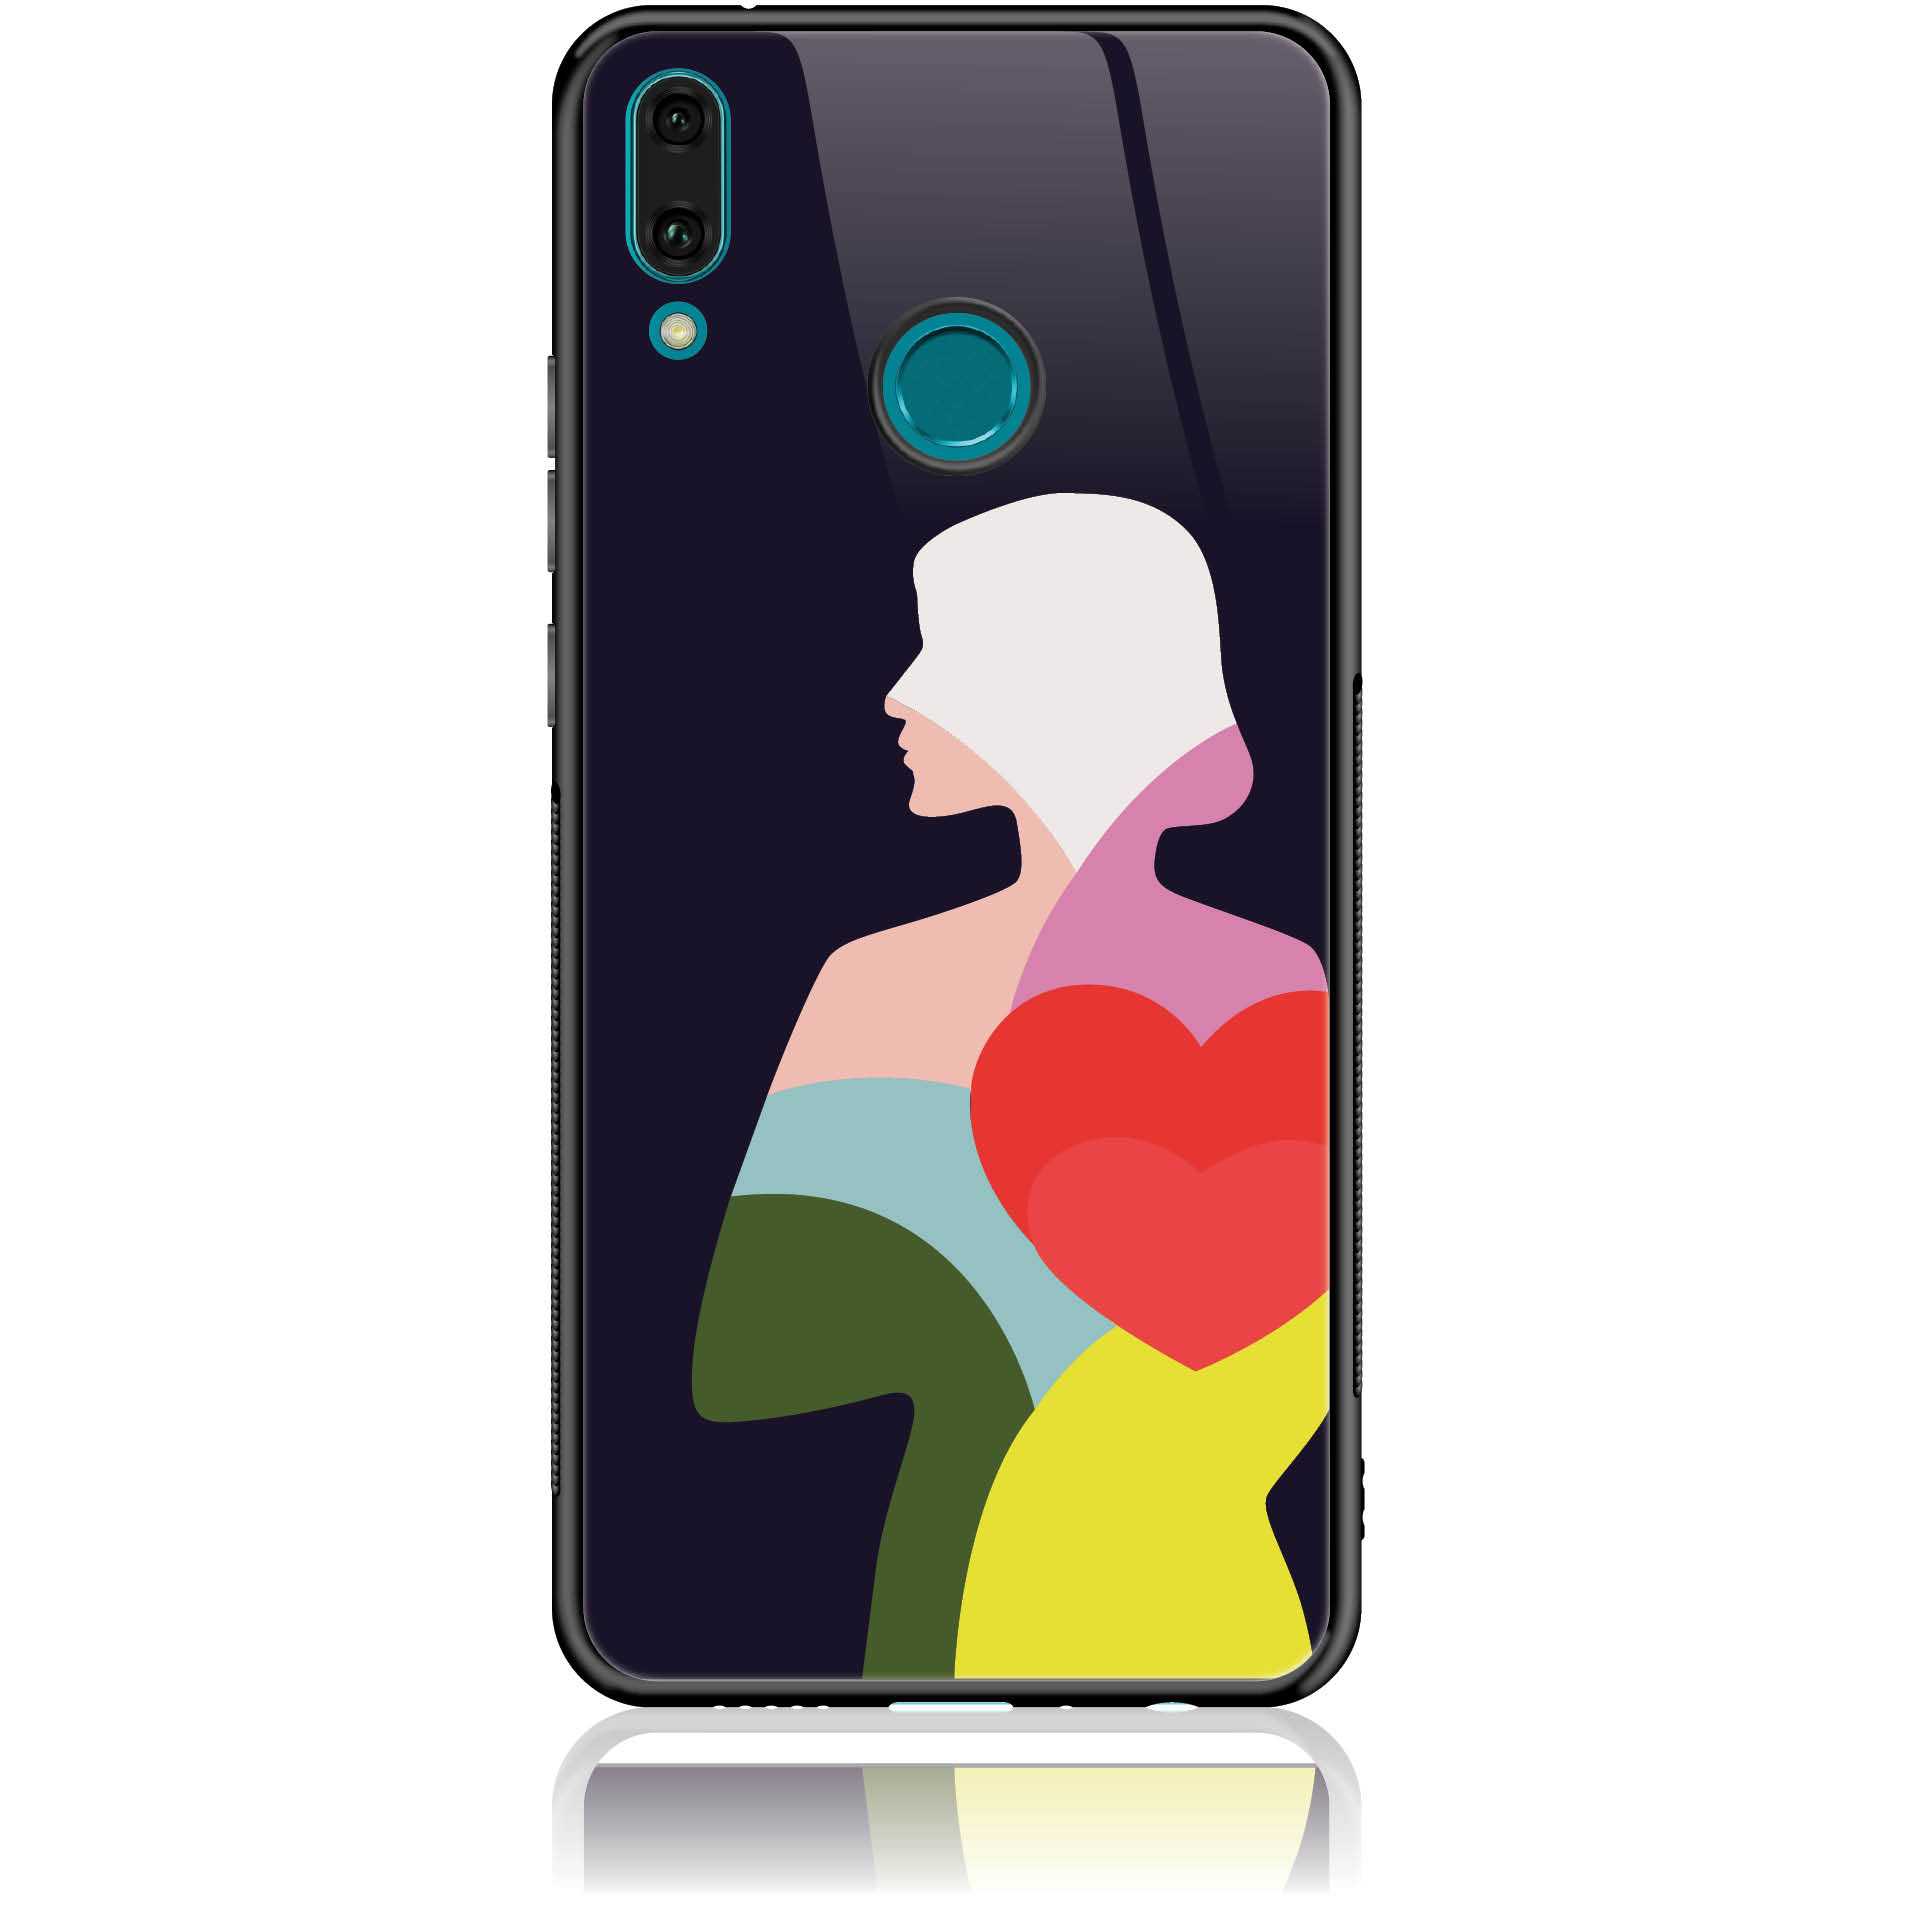 Case Design 50401  -  Huawei Enjoy 9 Plus  -  Tempered Glass Case